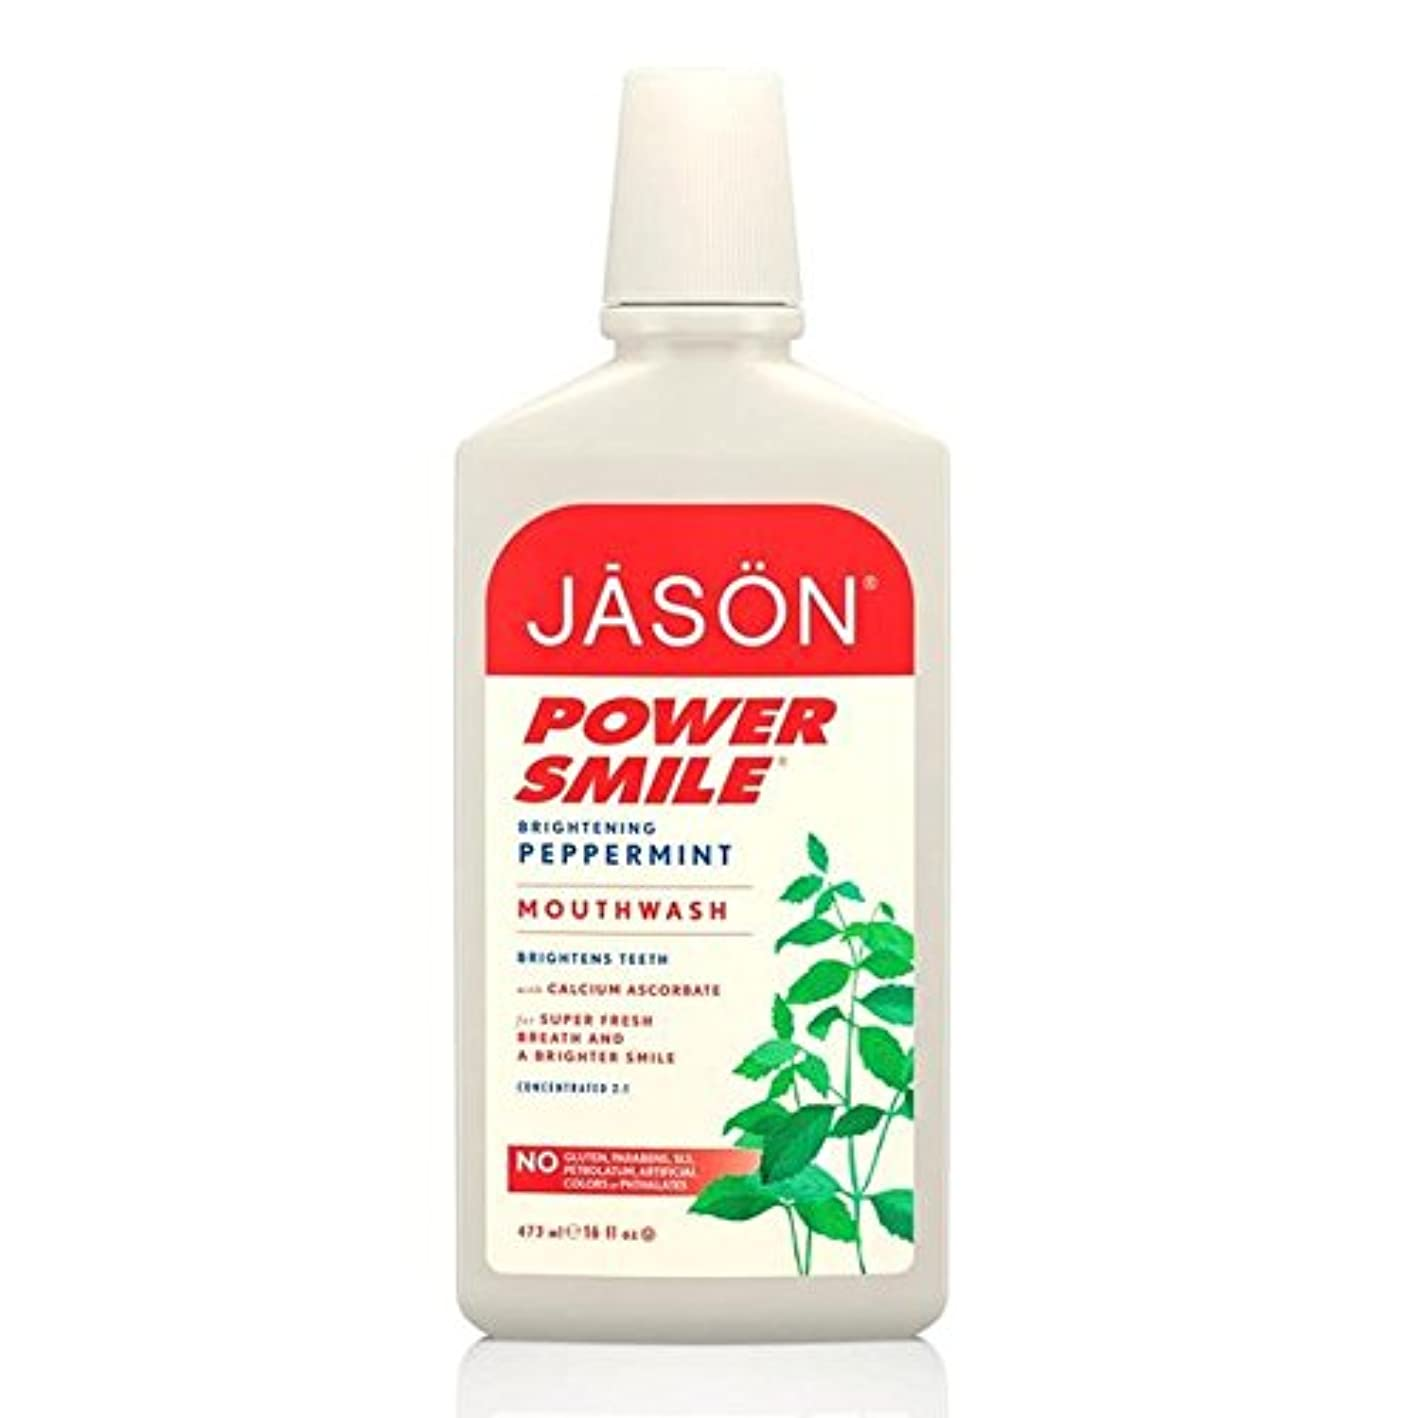 Jason Powersmile Mouthwash 480ml - ジェイソンマウスウォッシュ480ミリリットル [並行輸入品]